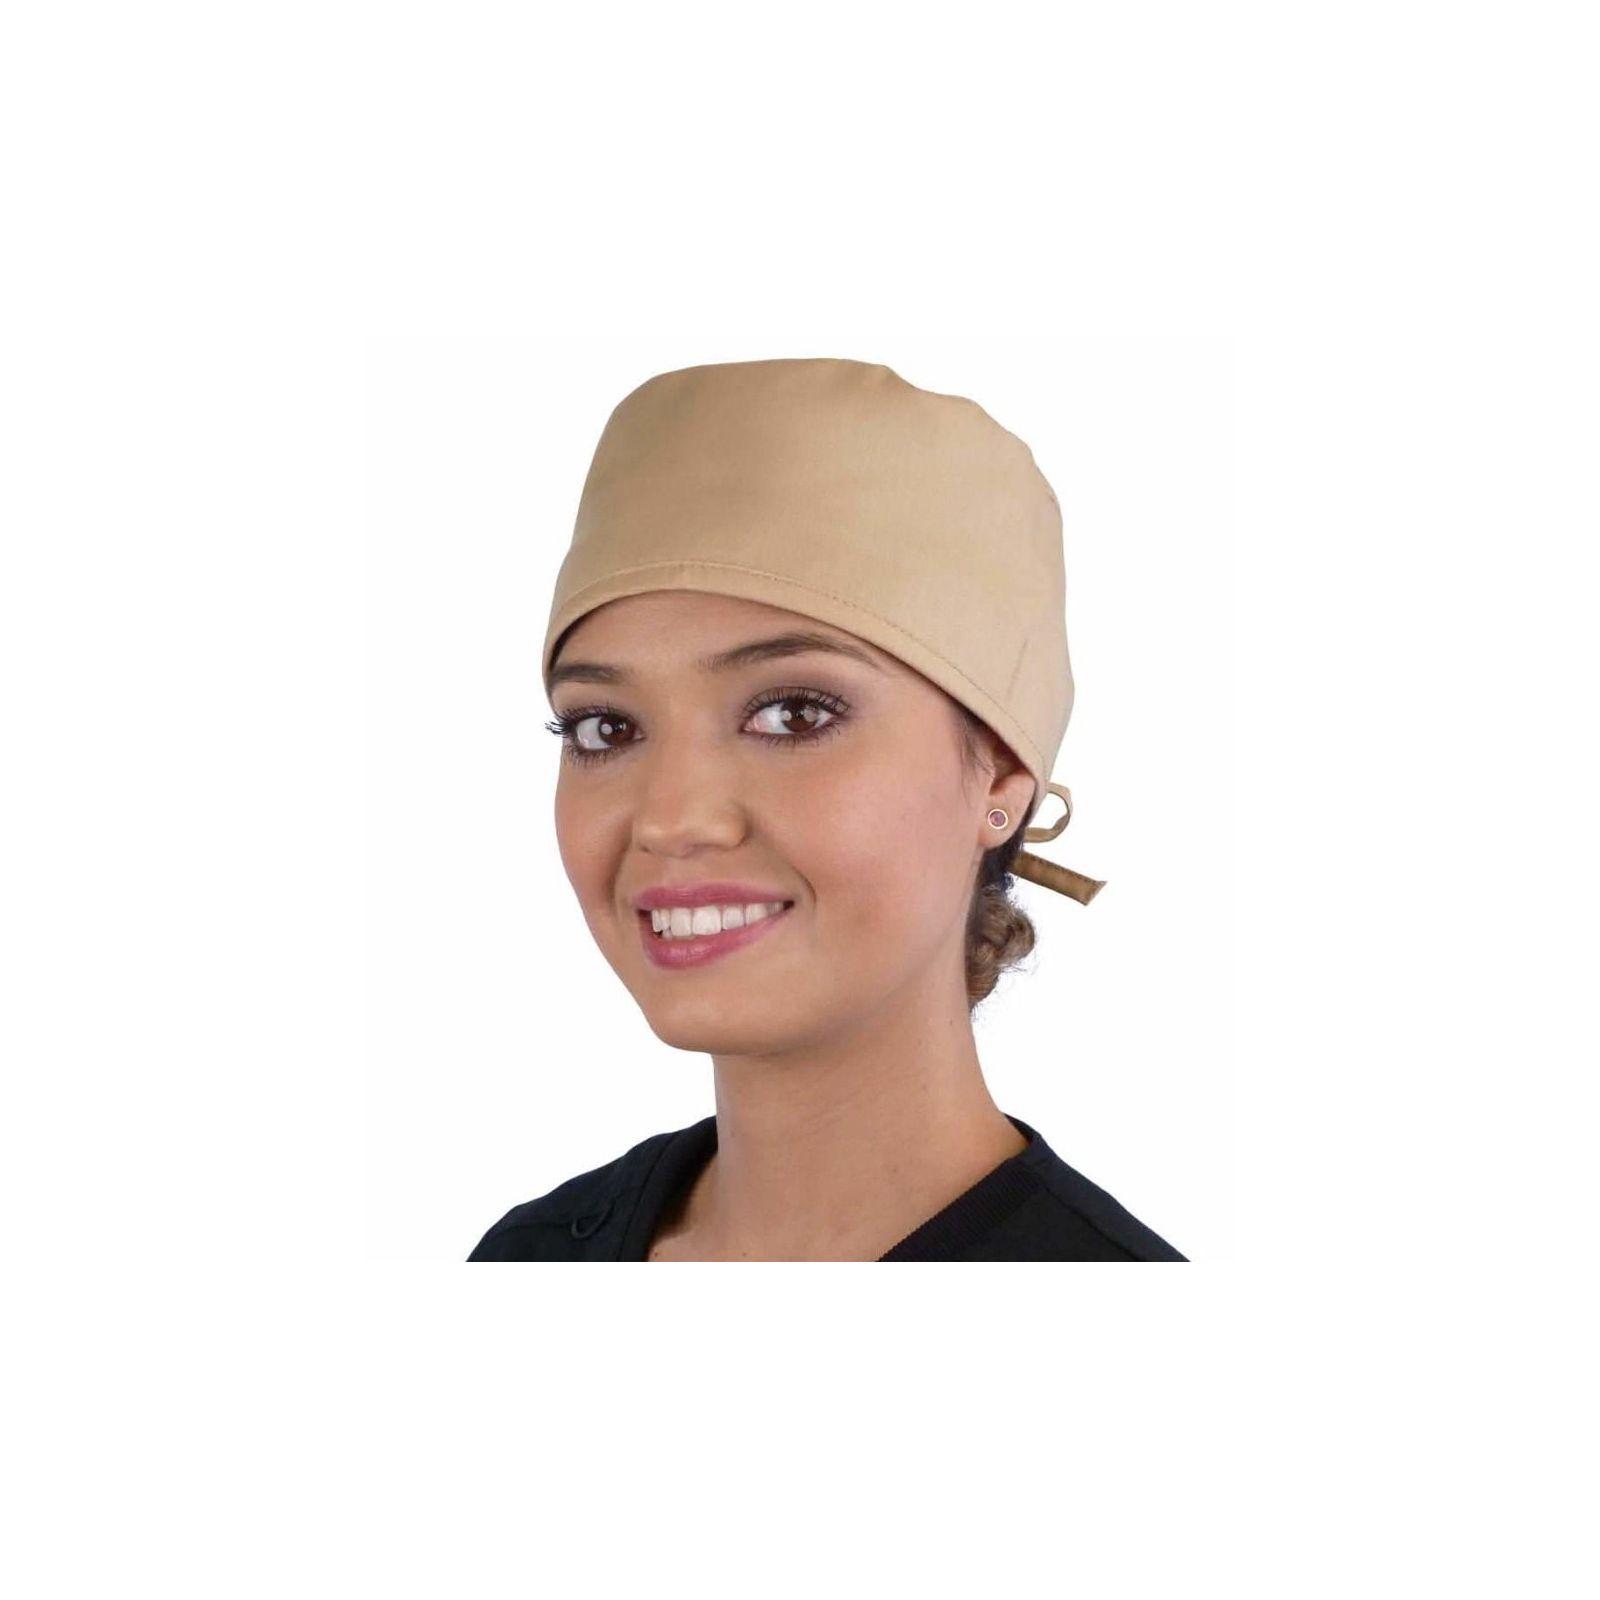 Calot médical Beige (210-1039) femme face